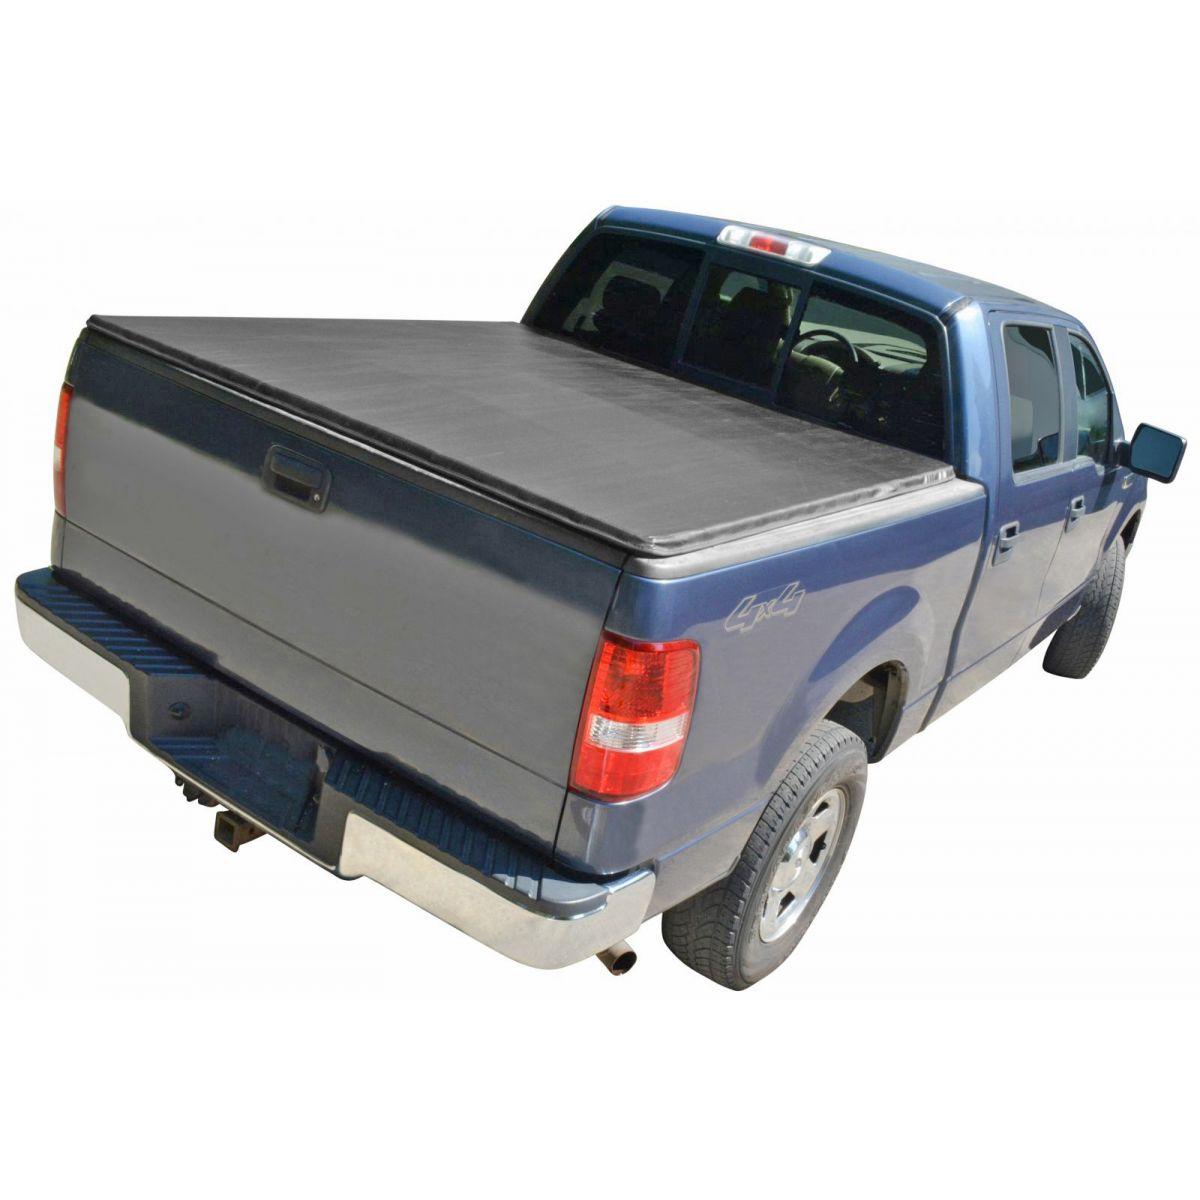 Tonneau Cover Soft Tri Fold For Ram 1500 2500 3500 Pickup Truck 6 5ft Short Bed Telesto Gr